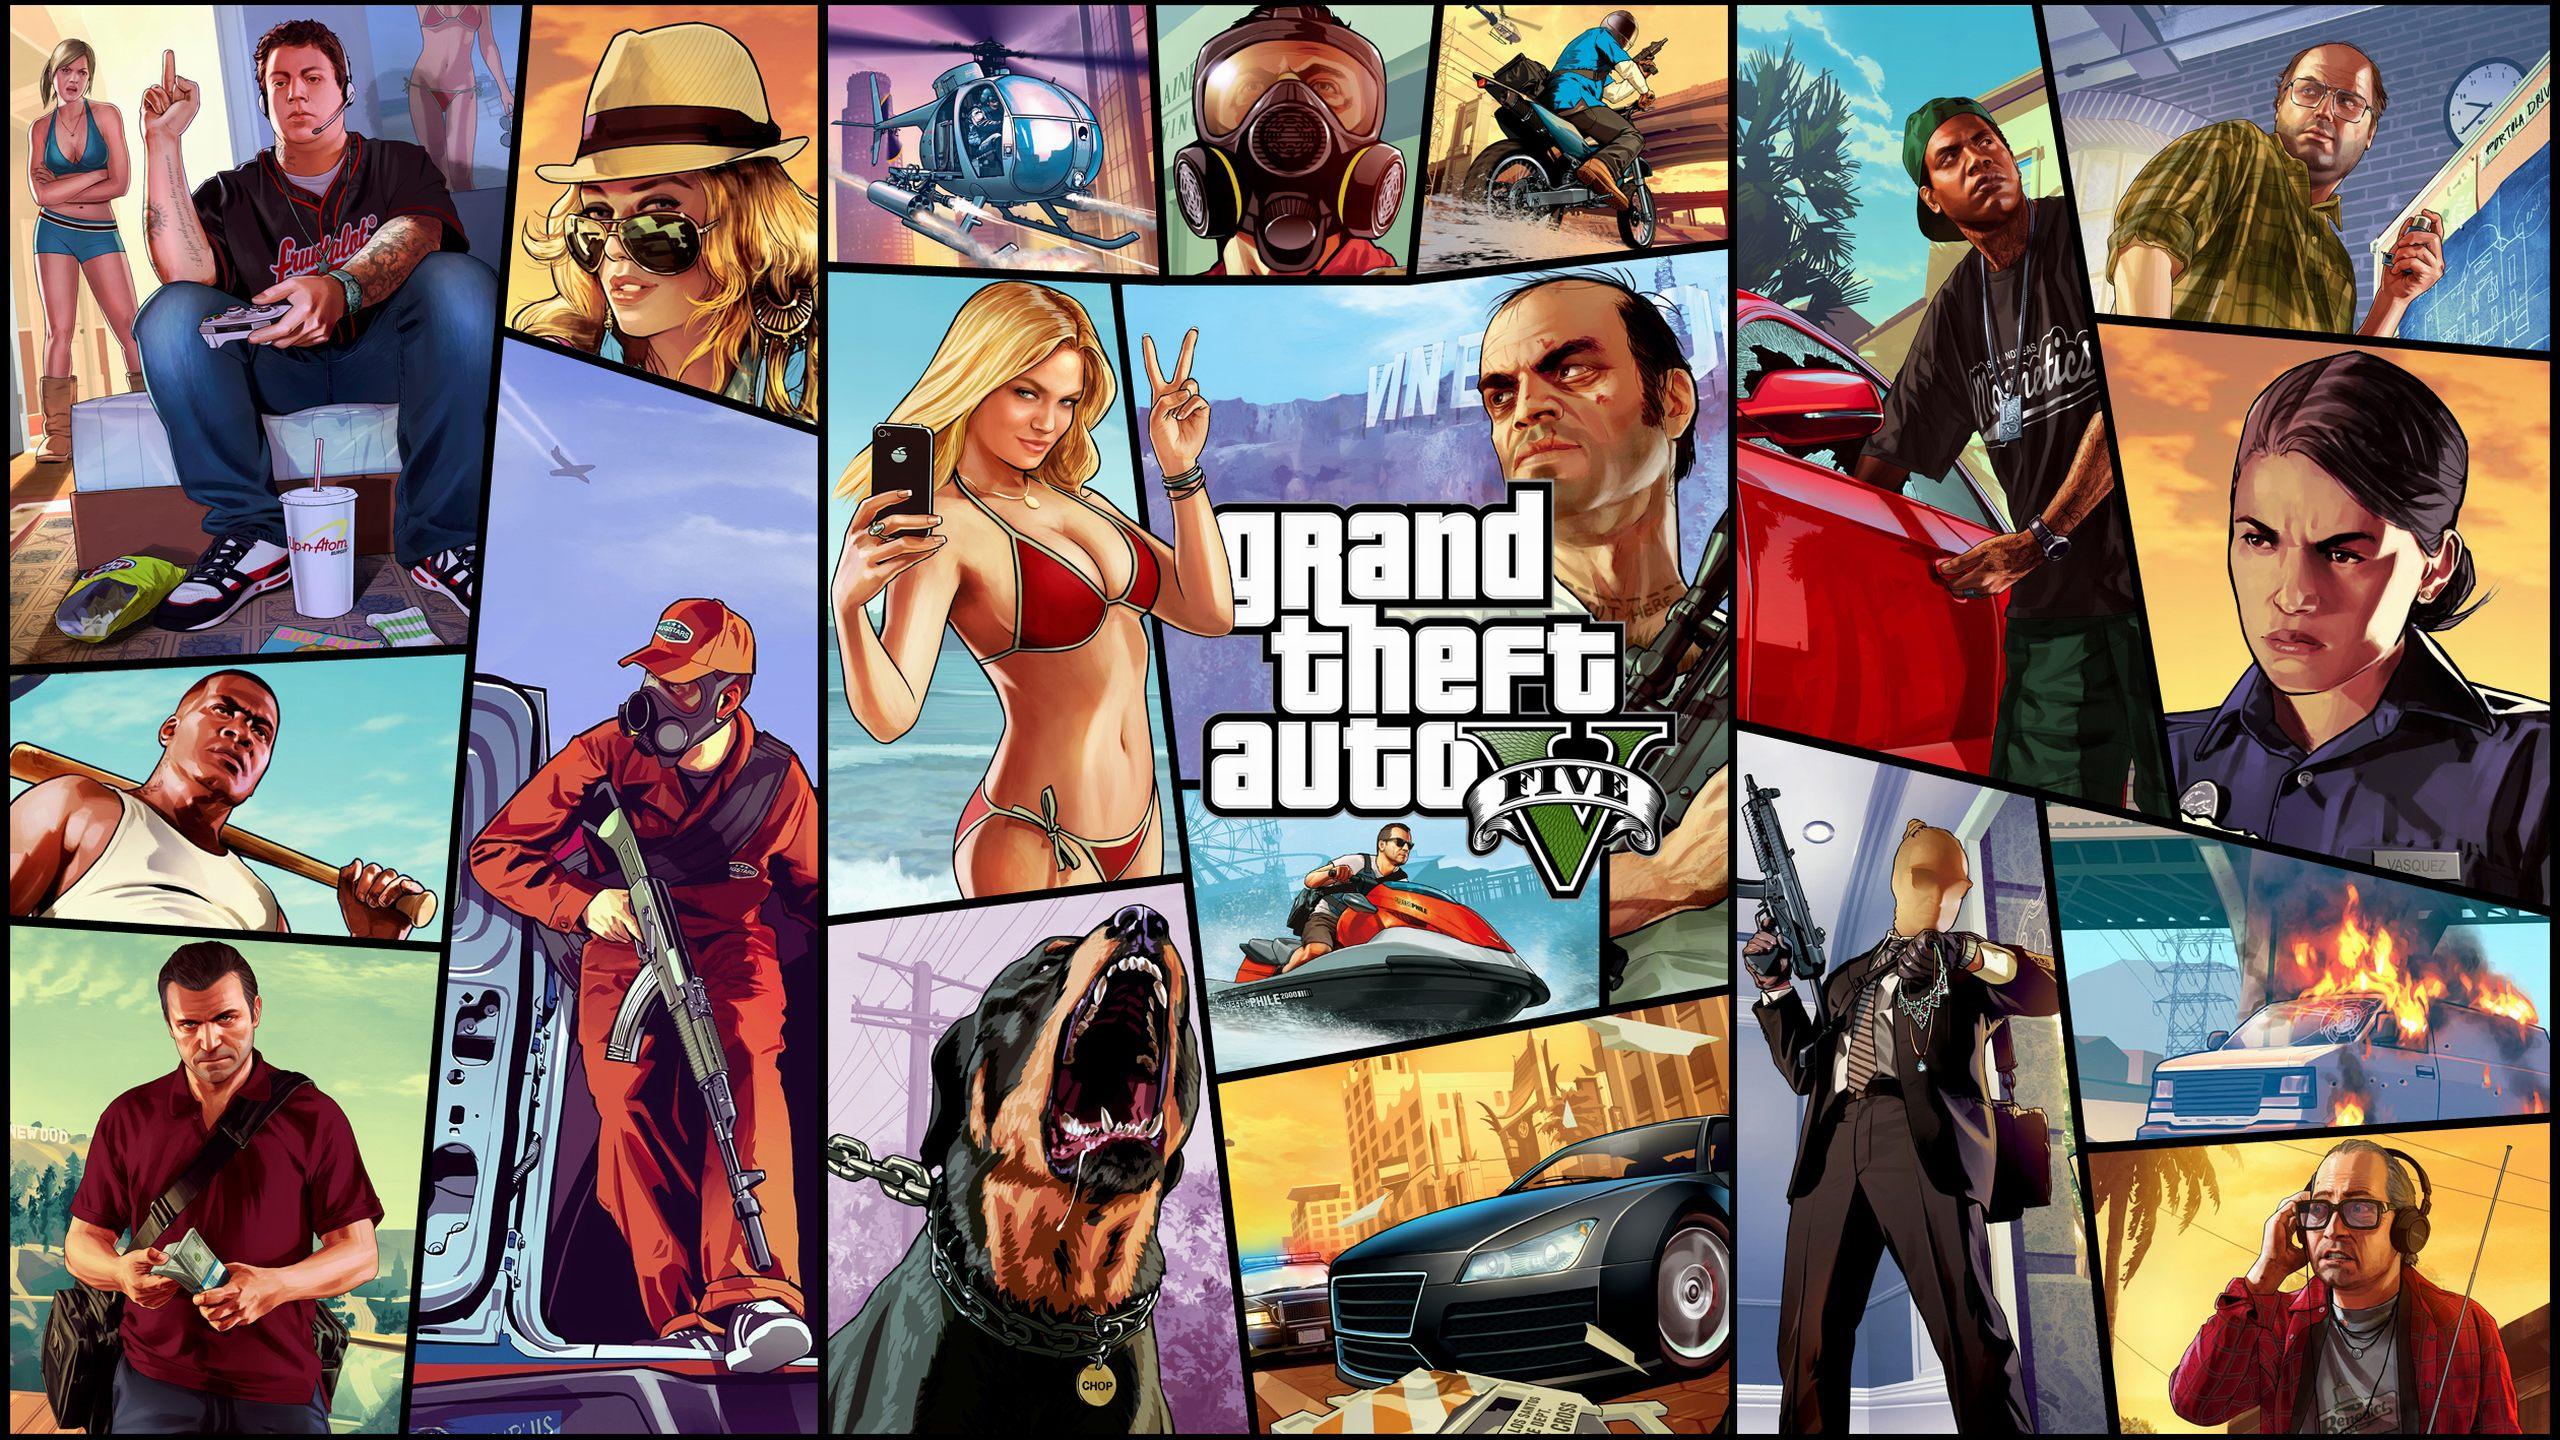 Grand Theft Auto V 壁紙 , HD Wallpaper & Backgrounds